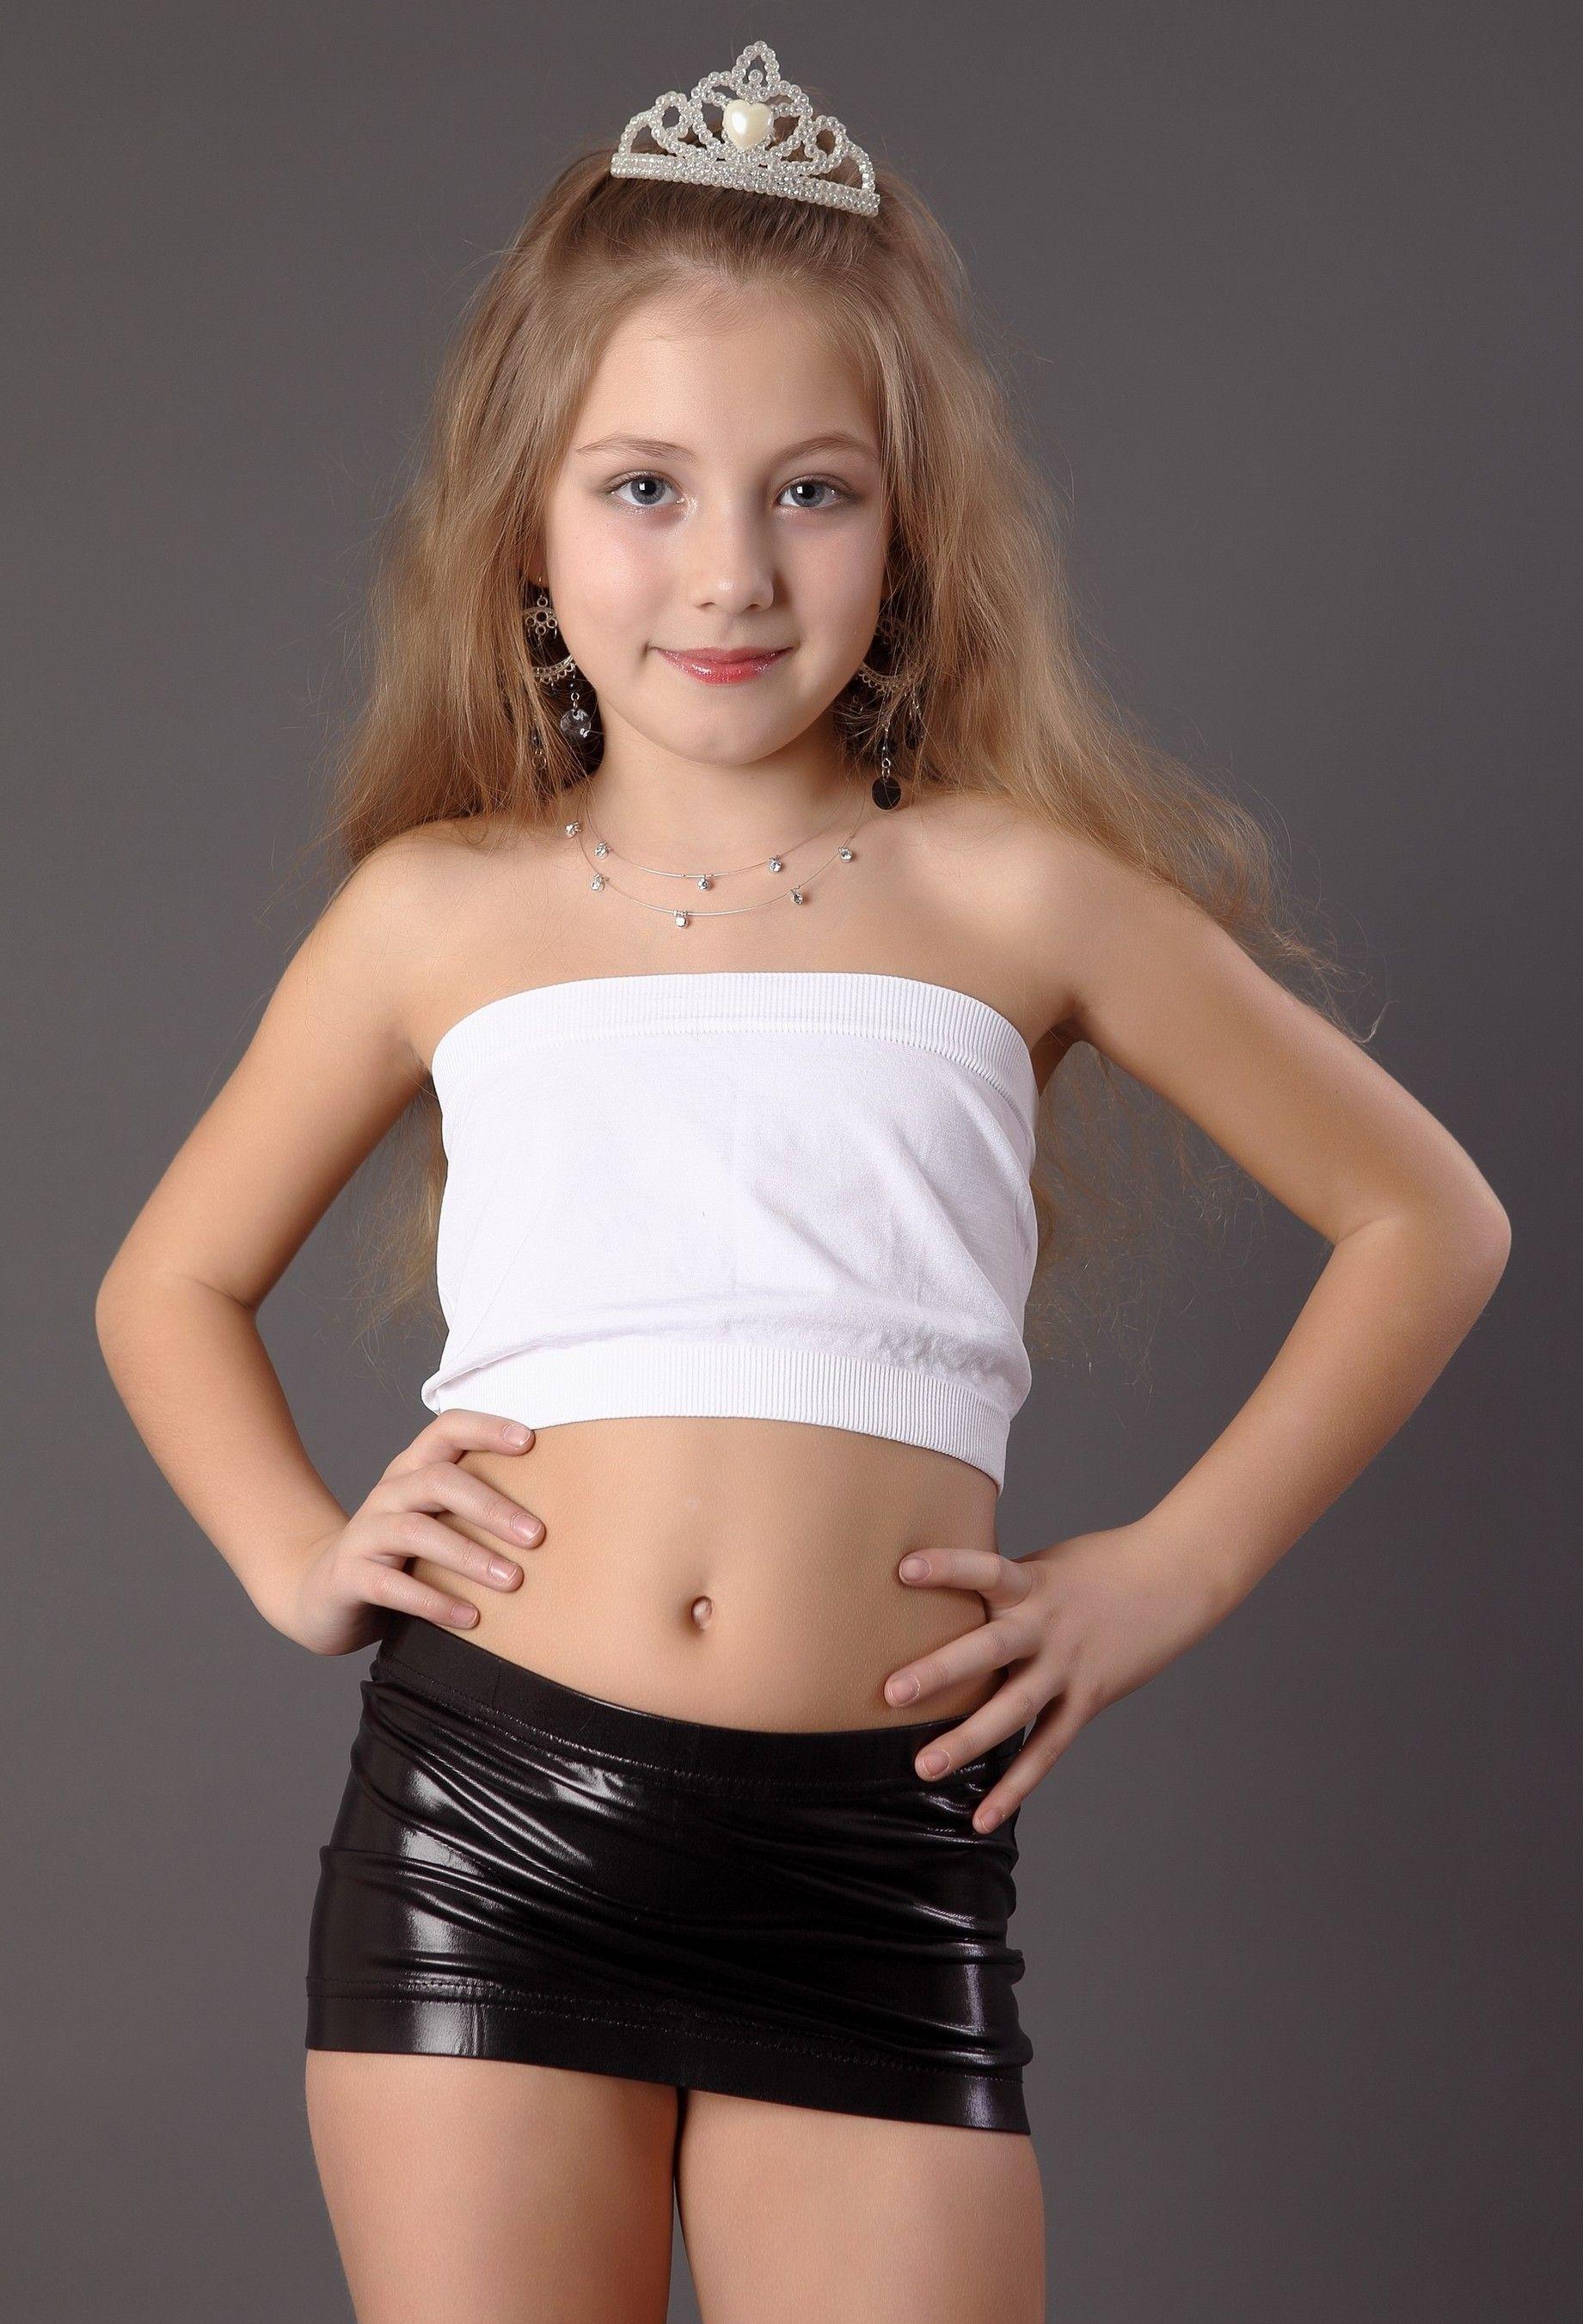 kids-dance-costume-Shiny-Dance-Mini-Skirt.jpg (1841×2703) | Dance ...